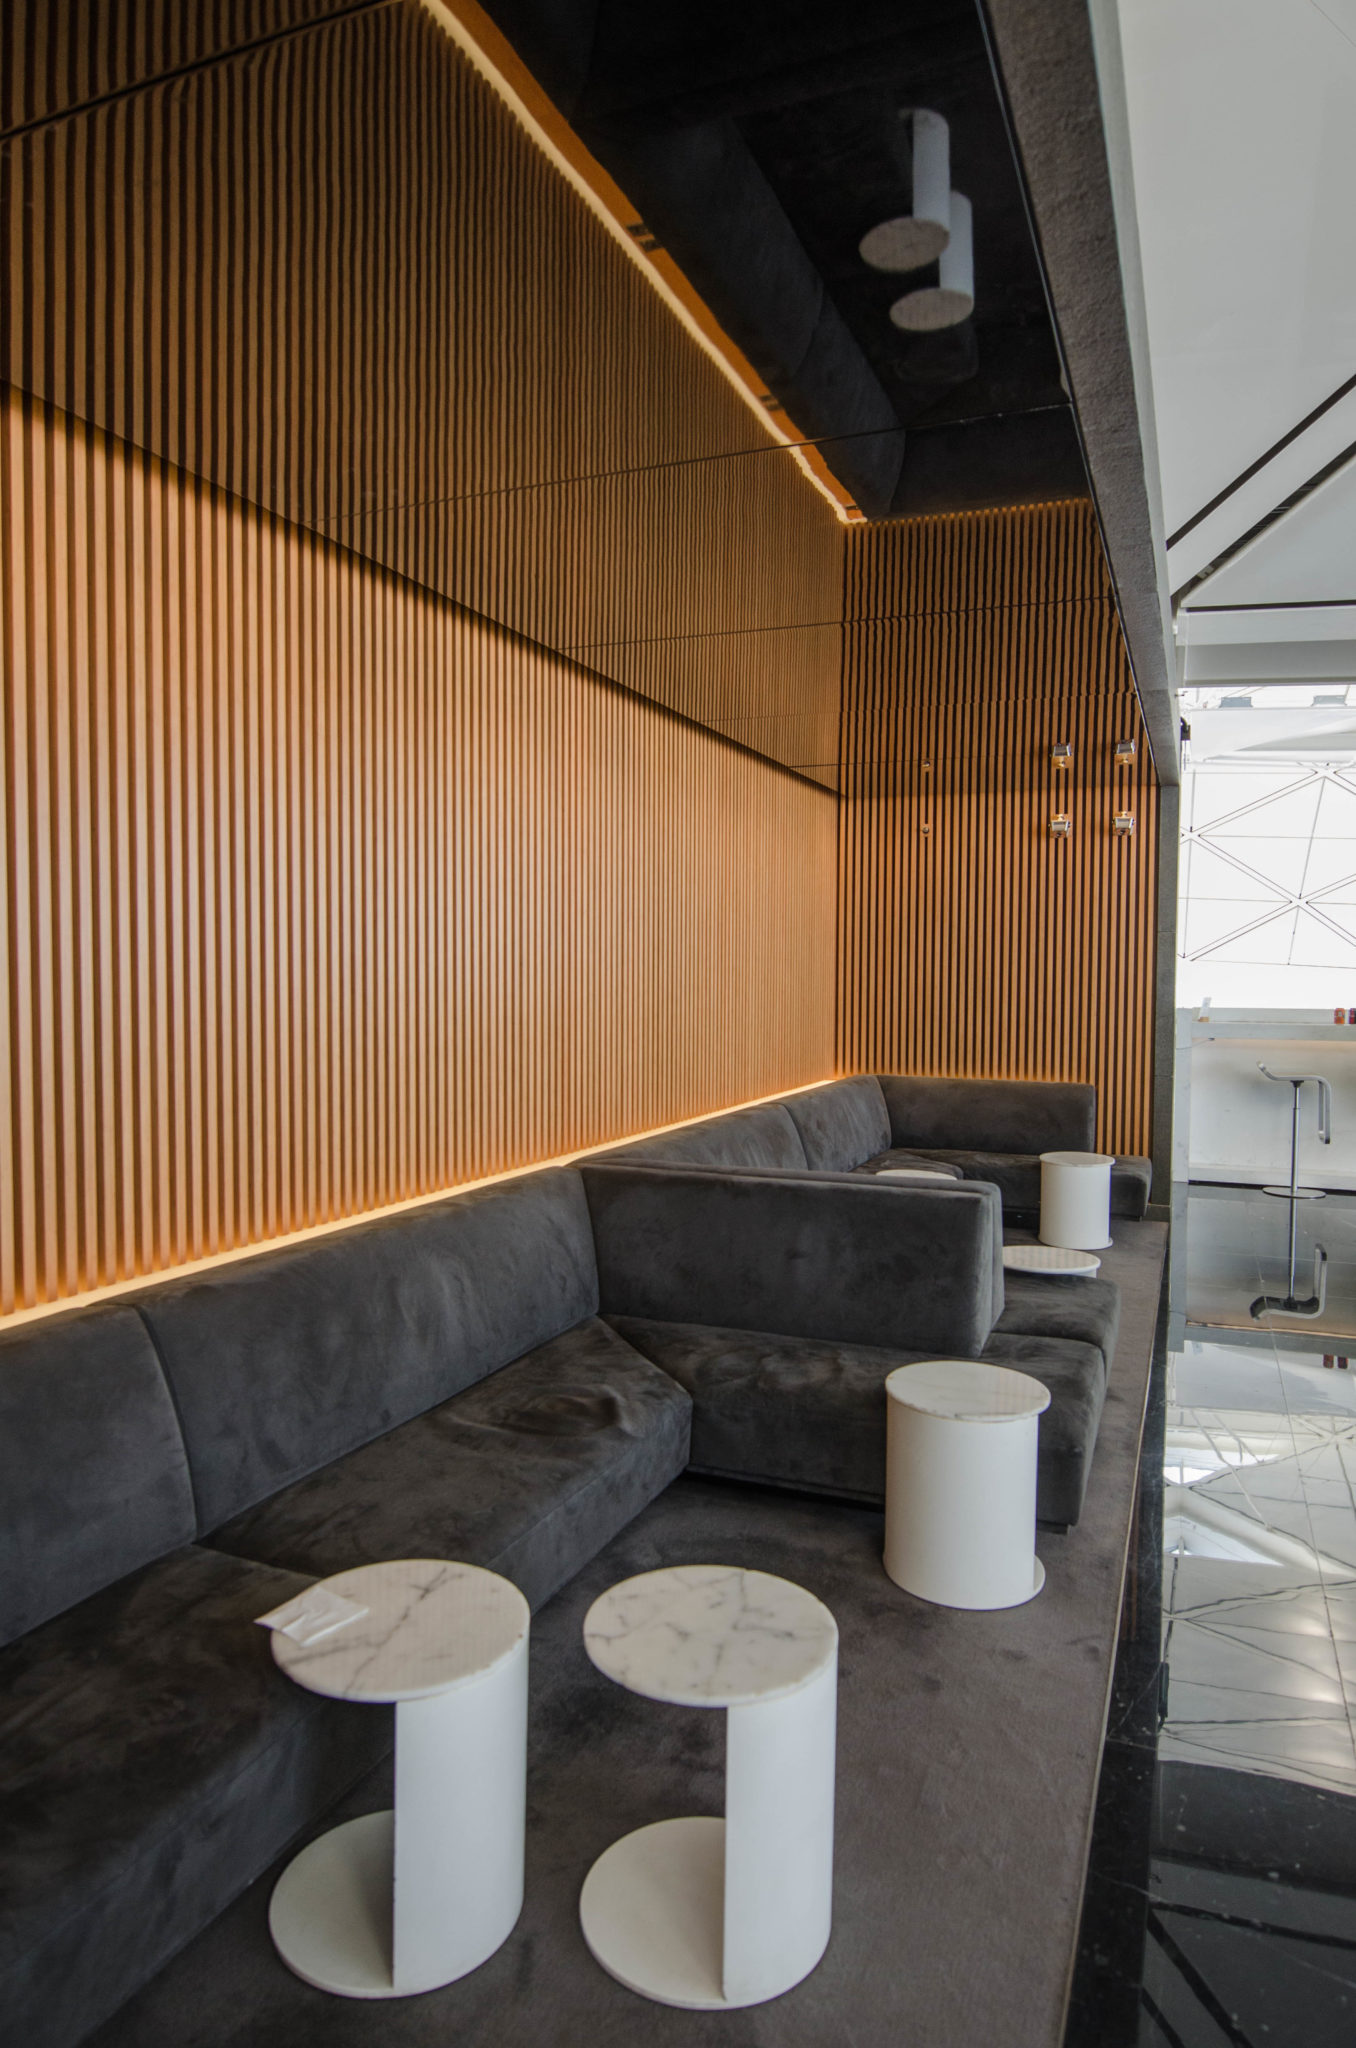 Die Cathay Lounge am Flughafen Hongkong